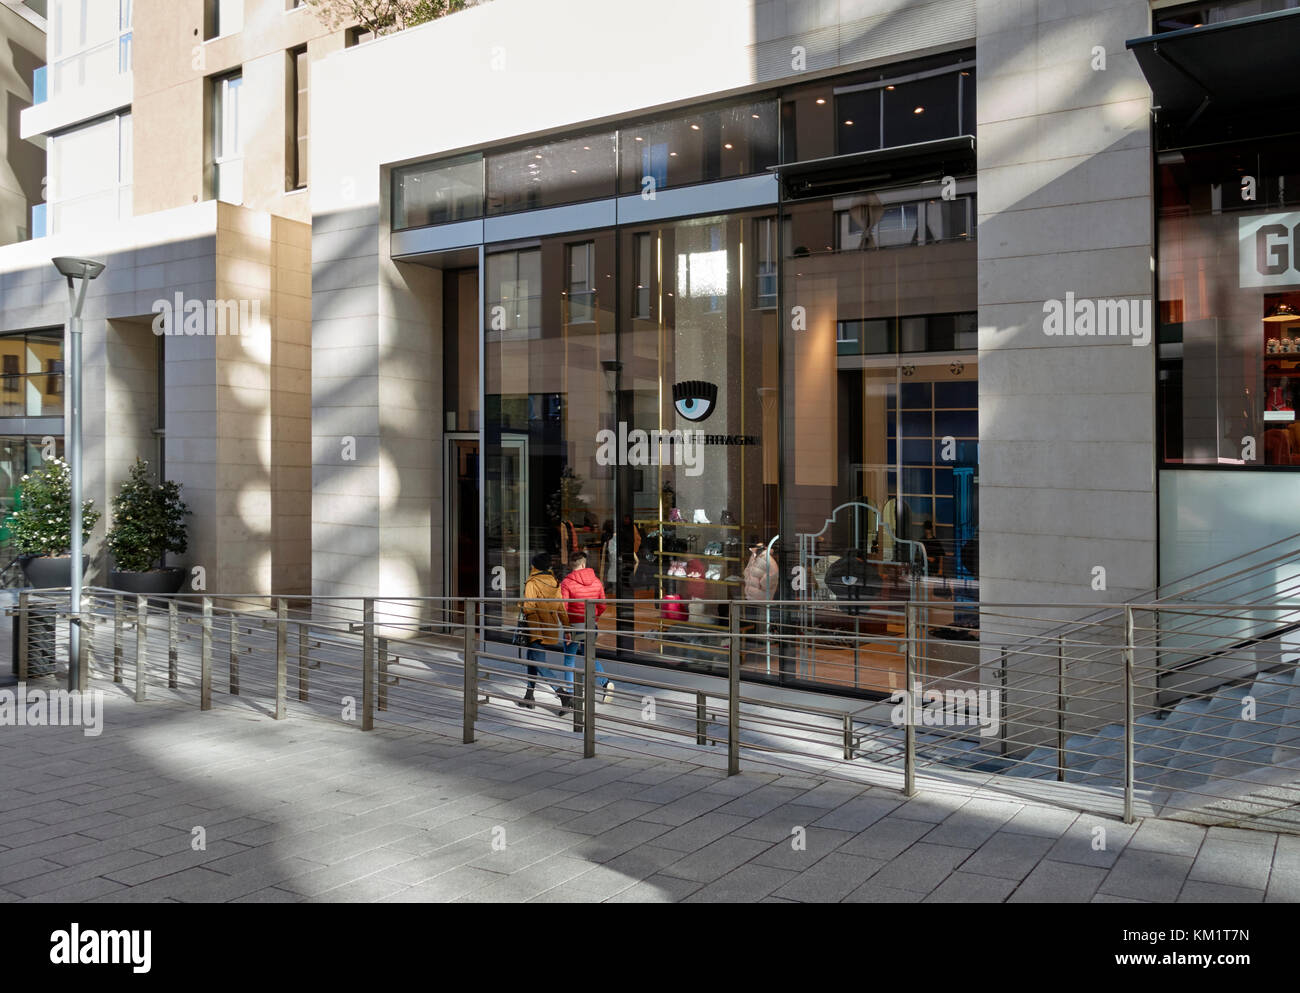 aae74010f99f24 Chiara Ferragni Fashion Stock Photos   Chiara Ferragni Fashion Stock ...